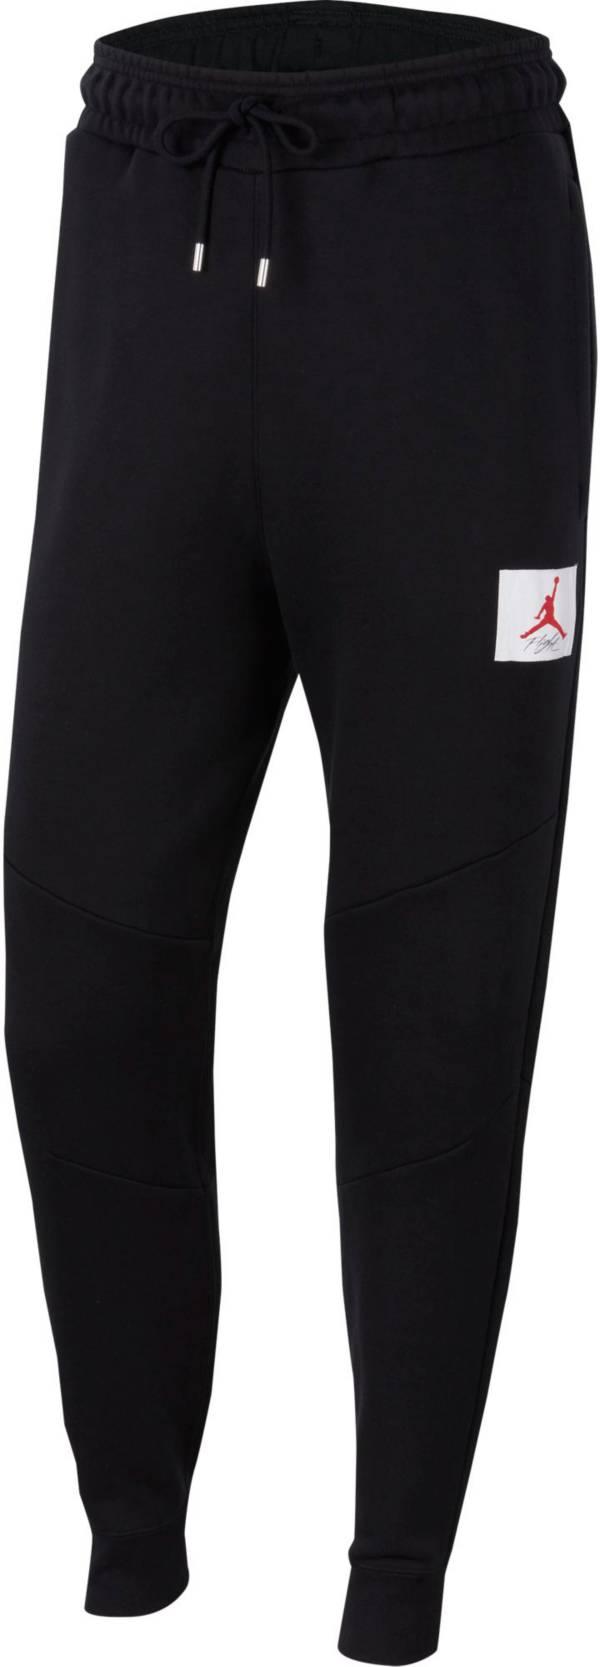 Jordan Men's Flight Fleece Pants product image